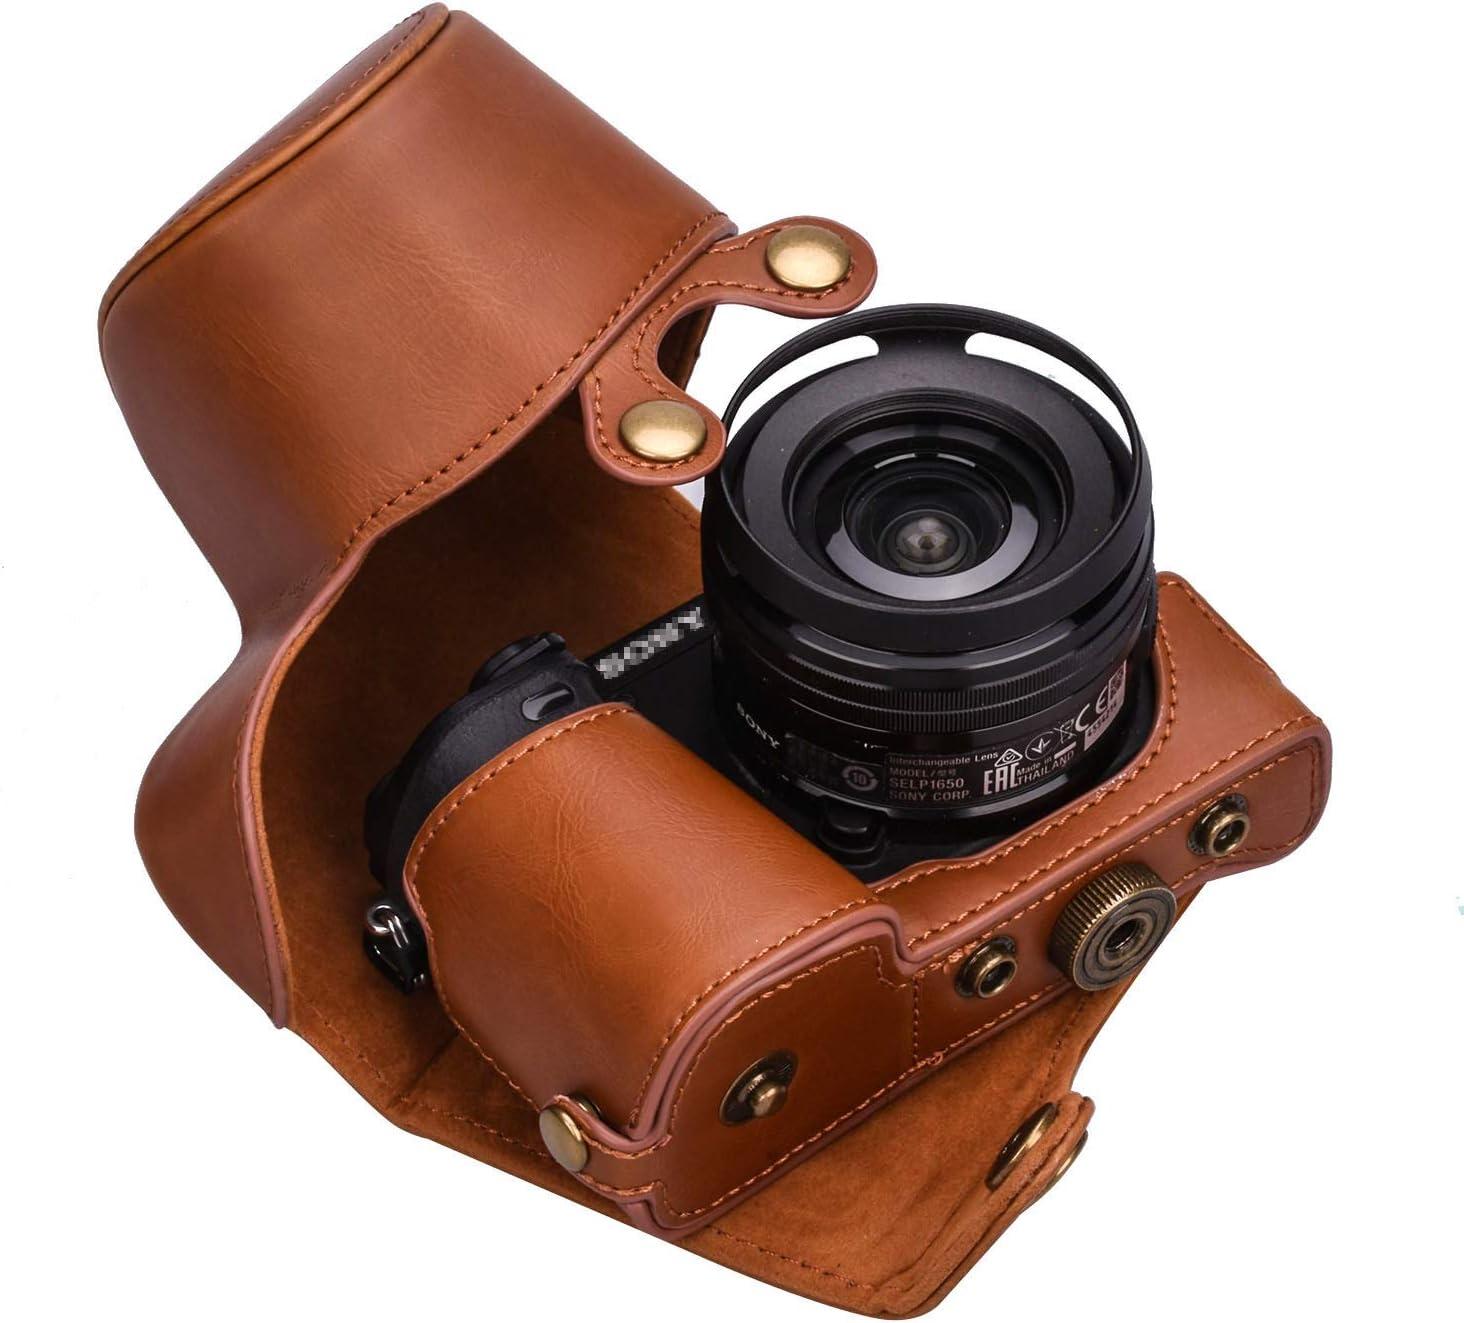 Xevn Sony A6300 Schutzhülle Sony A6000 Hülle Premium Pu Leder Kameratasche Für Sony Alpha A6300 A6000 Für 16 50 Mm Objektiv Kameragurt Und Handschlaufe Beauty